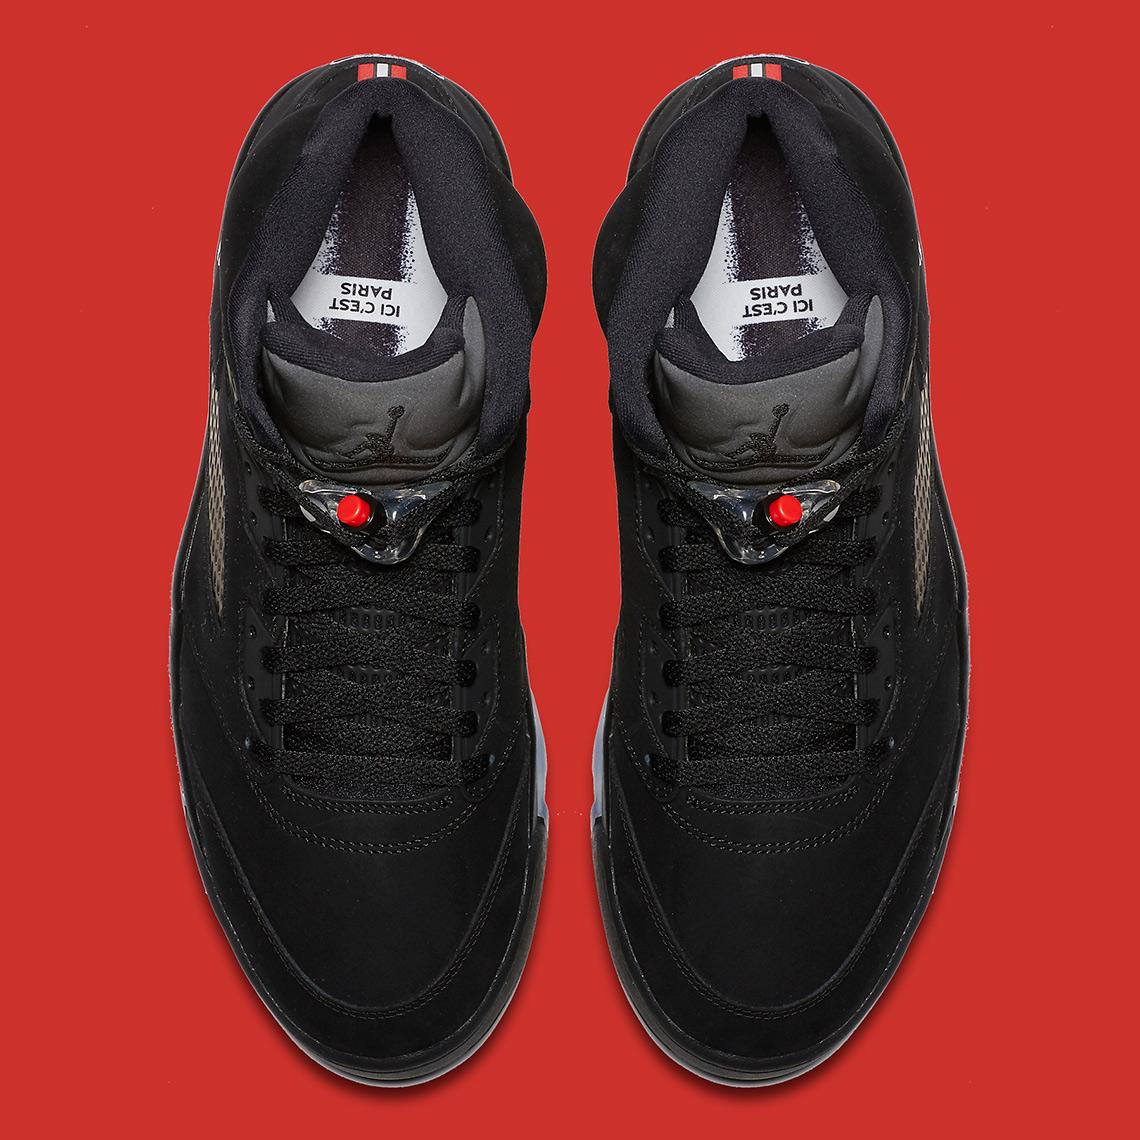 19d6ec688d7 Air Jordan 5 PSG AV9175-001 Photos + Release Info | SneakerNews.com